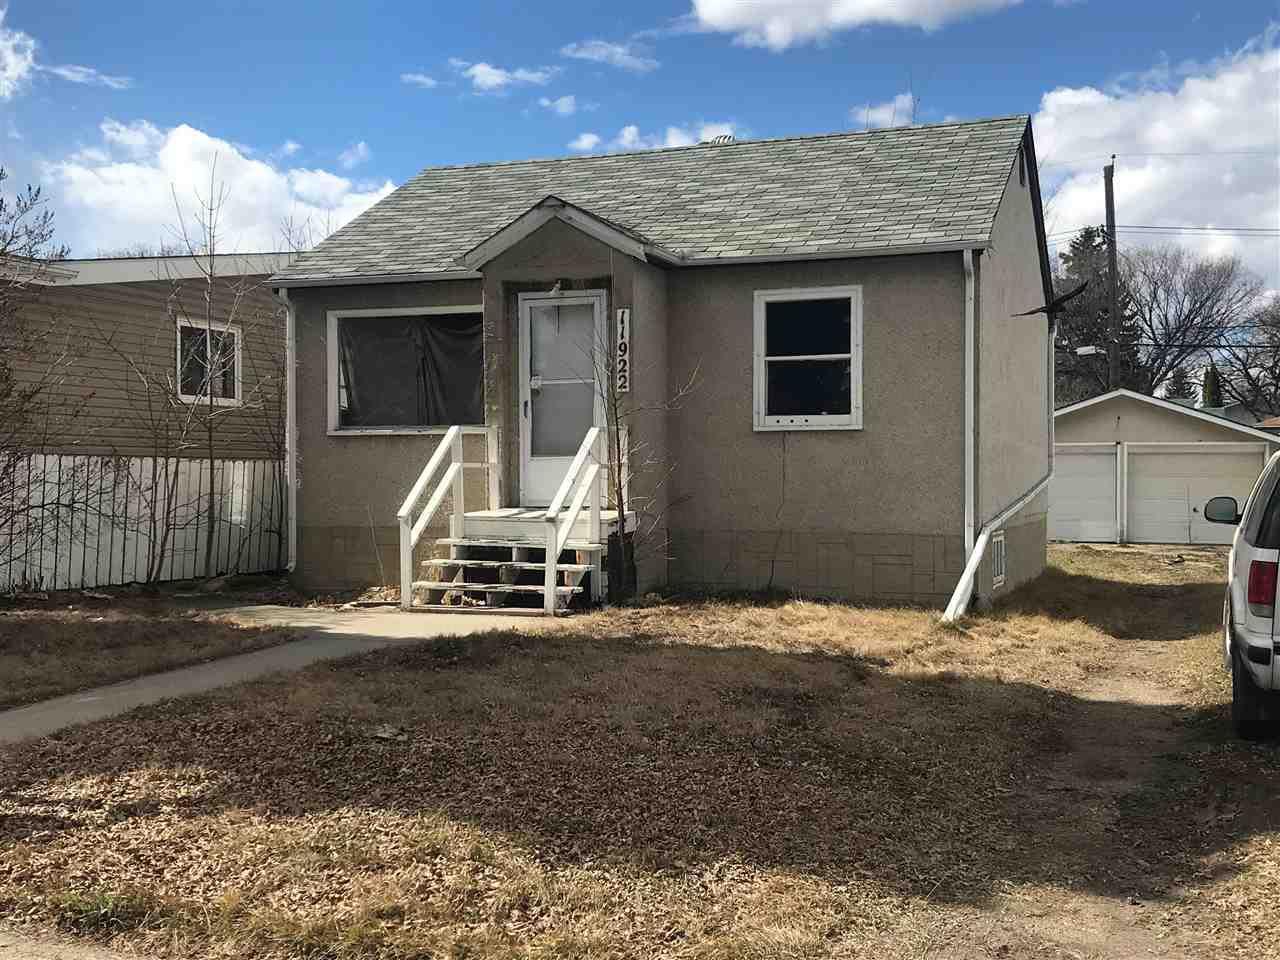 Main Photo: 11922 40 Street in Edmonton: Zone 23 House for sale : MLS®# E4146084